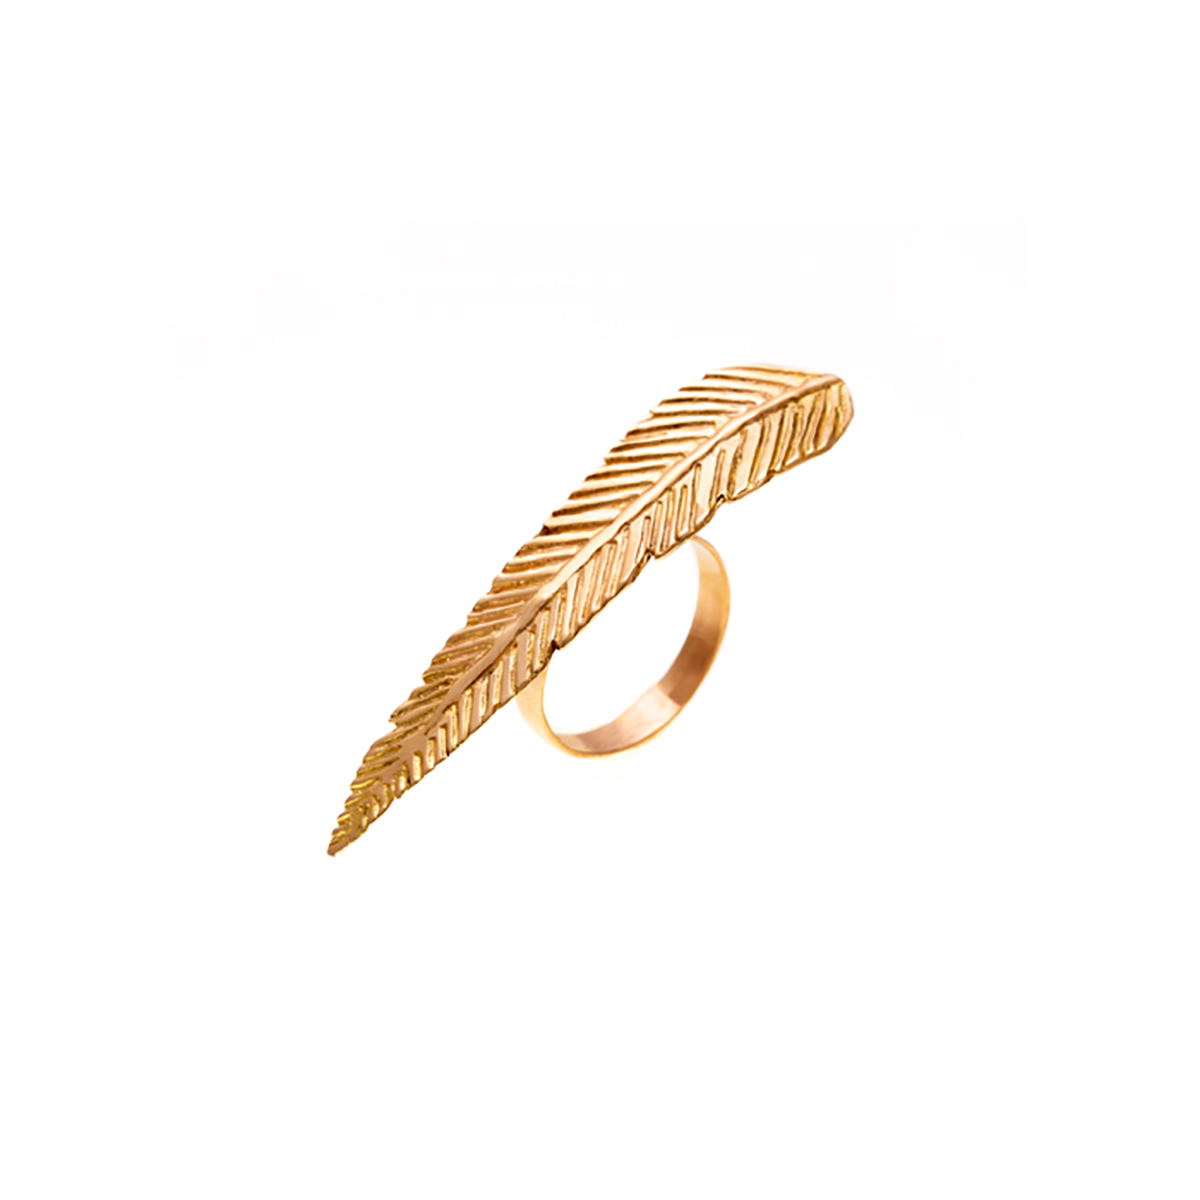 انگشتر طلا پر سه انگشتی